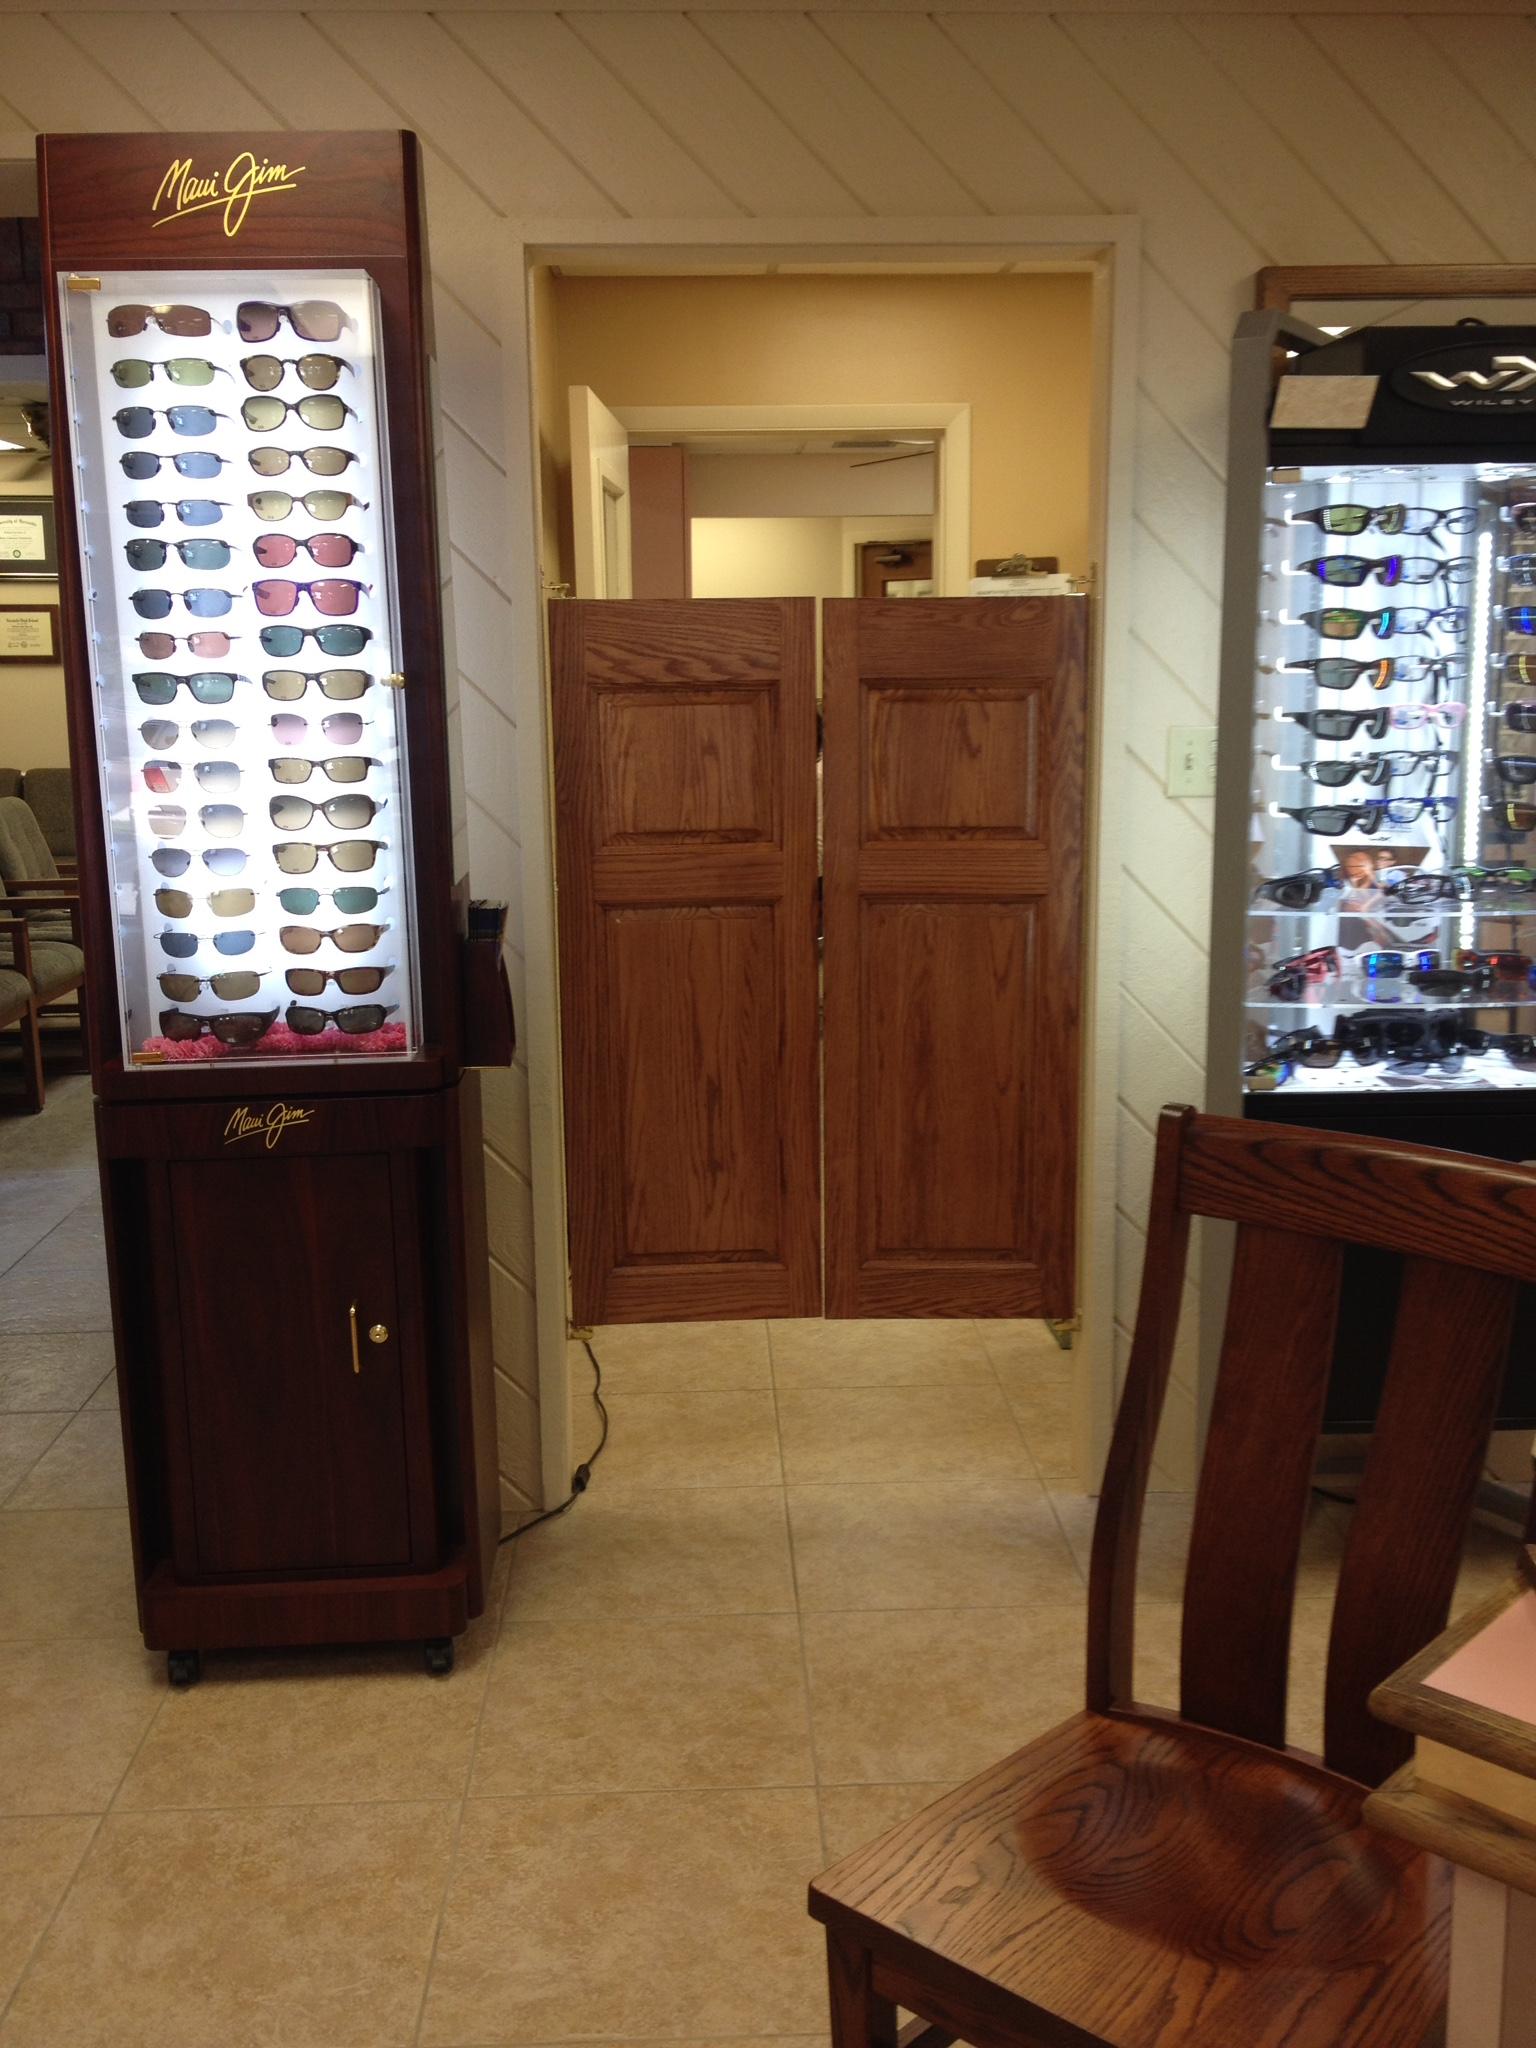 commercial-oak-saloon-doors.jpg & Custom Commercial Swinging Oak Cafe / Saloon Doors (36\u0027 - 42\